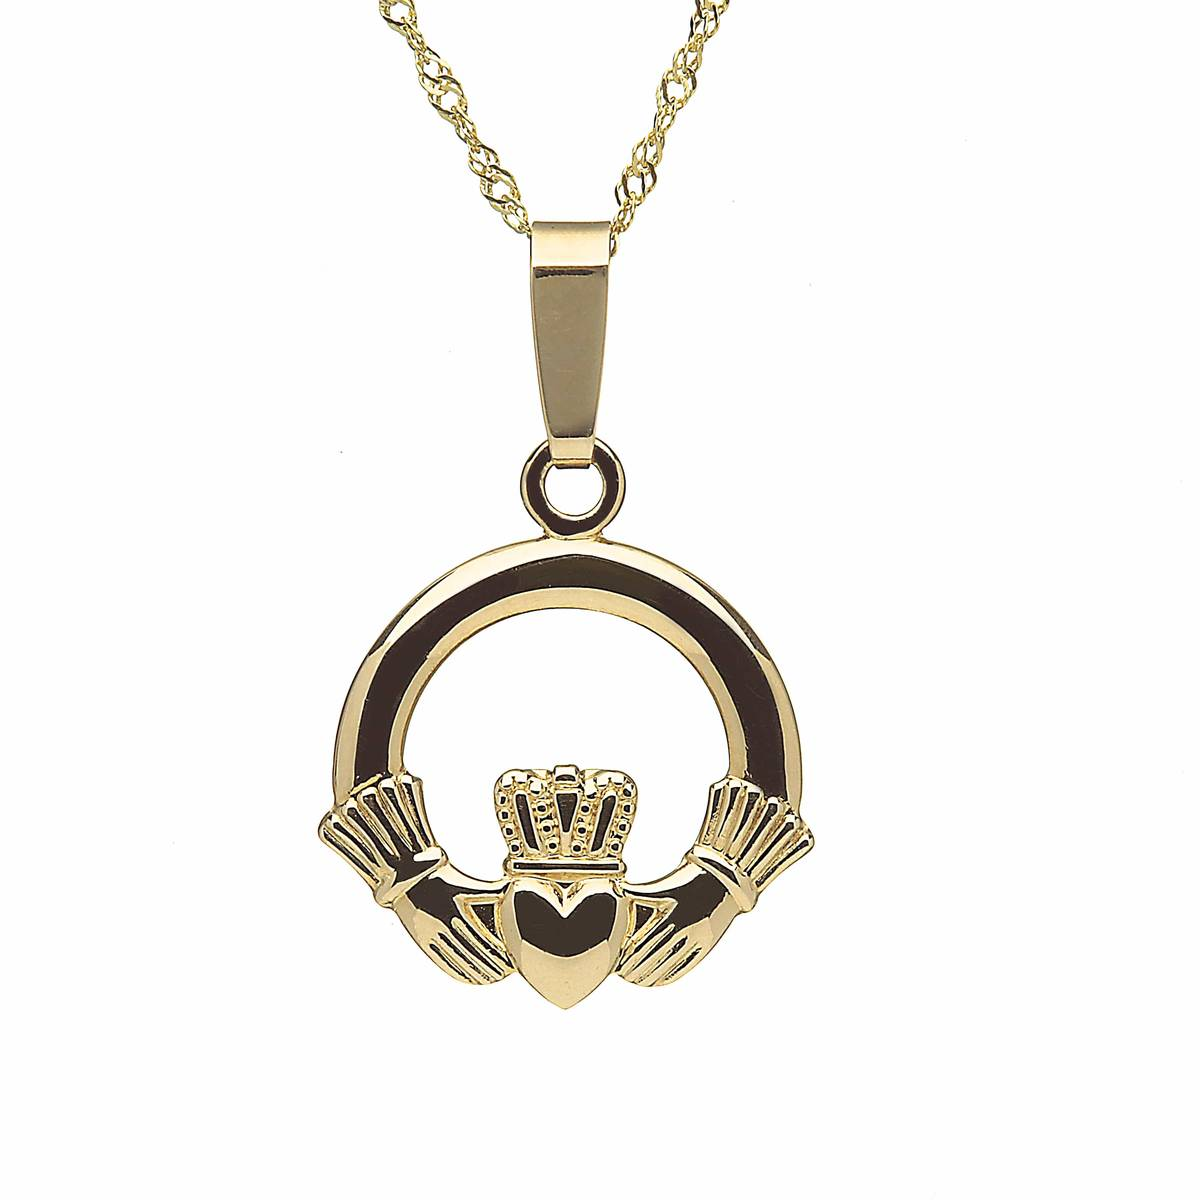 10 carat yellow gold classic Claddagh pendant